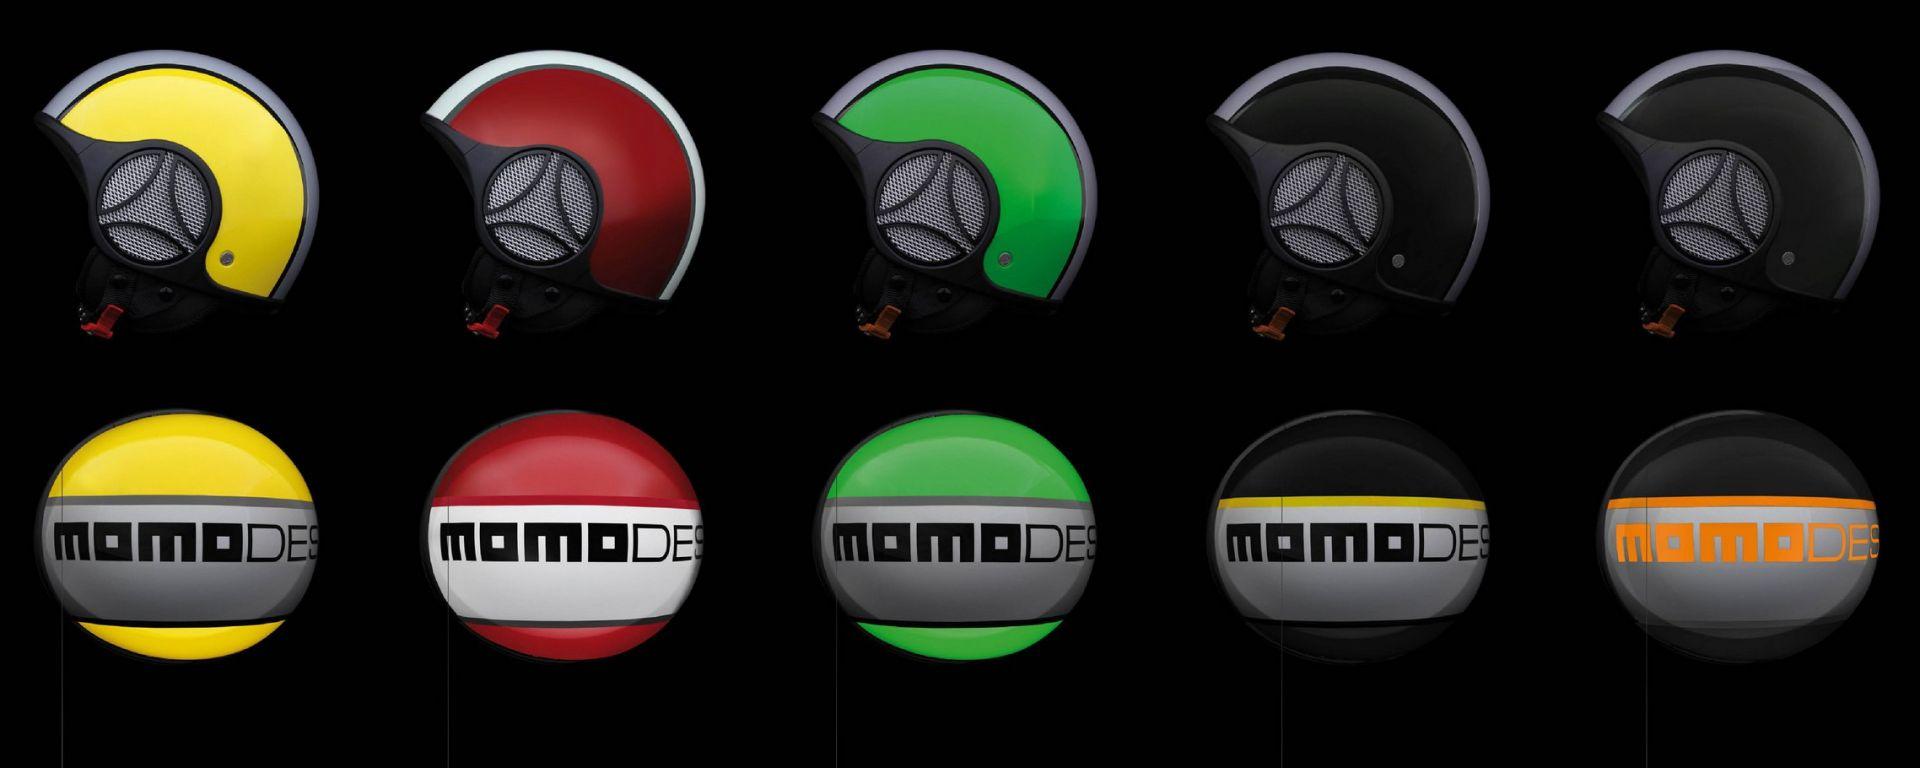 Momodesign: Minimomo e FGTR Classic